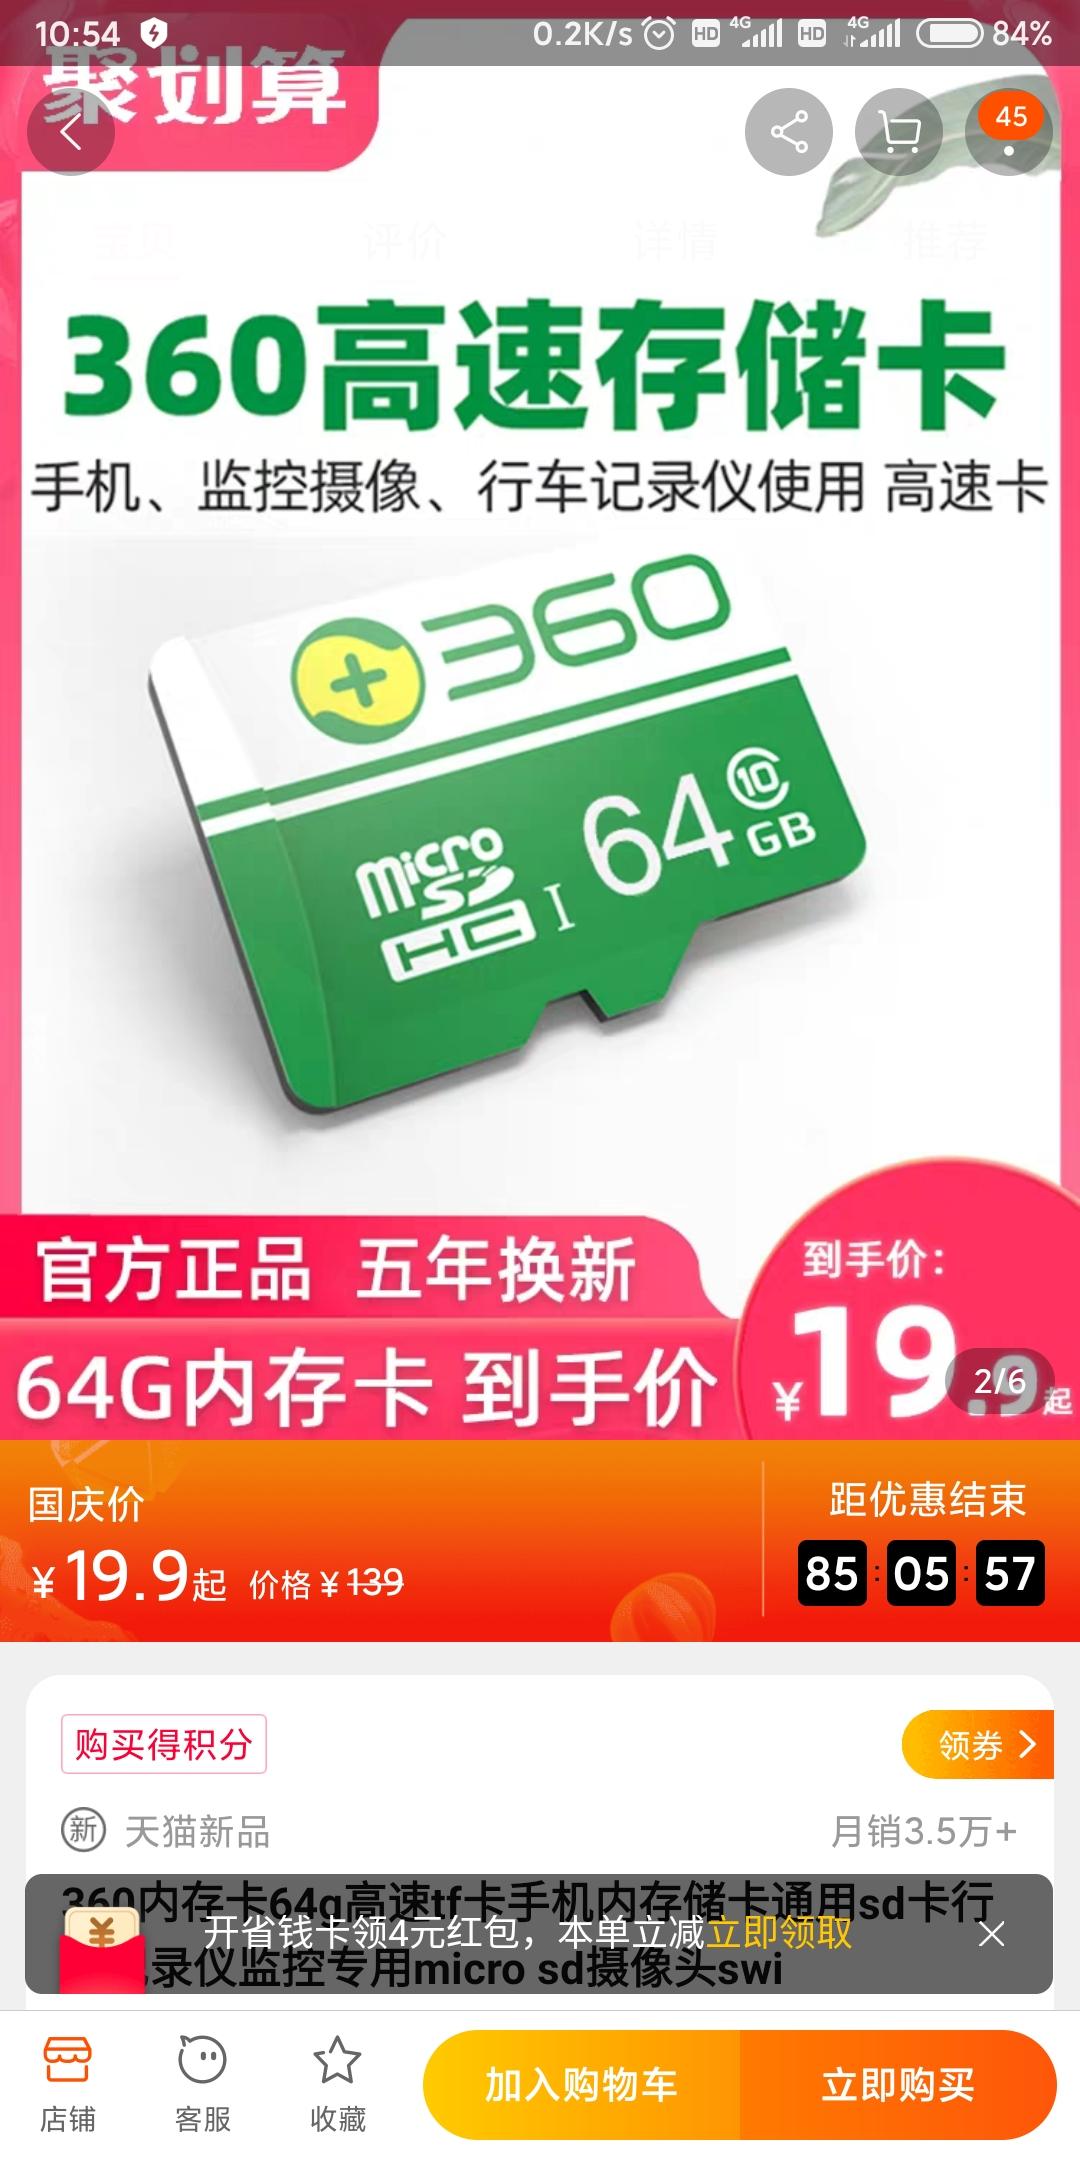 Screenshot_2020-10-04-10-54-00-830_com.taobao.taobao.jpg